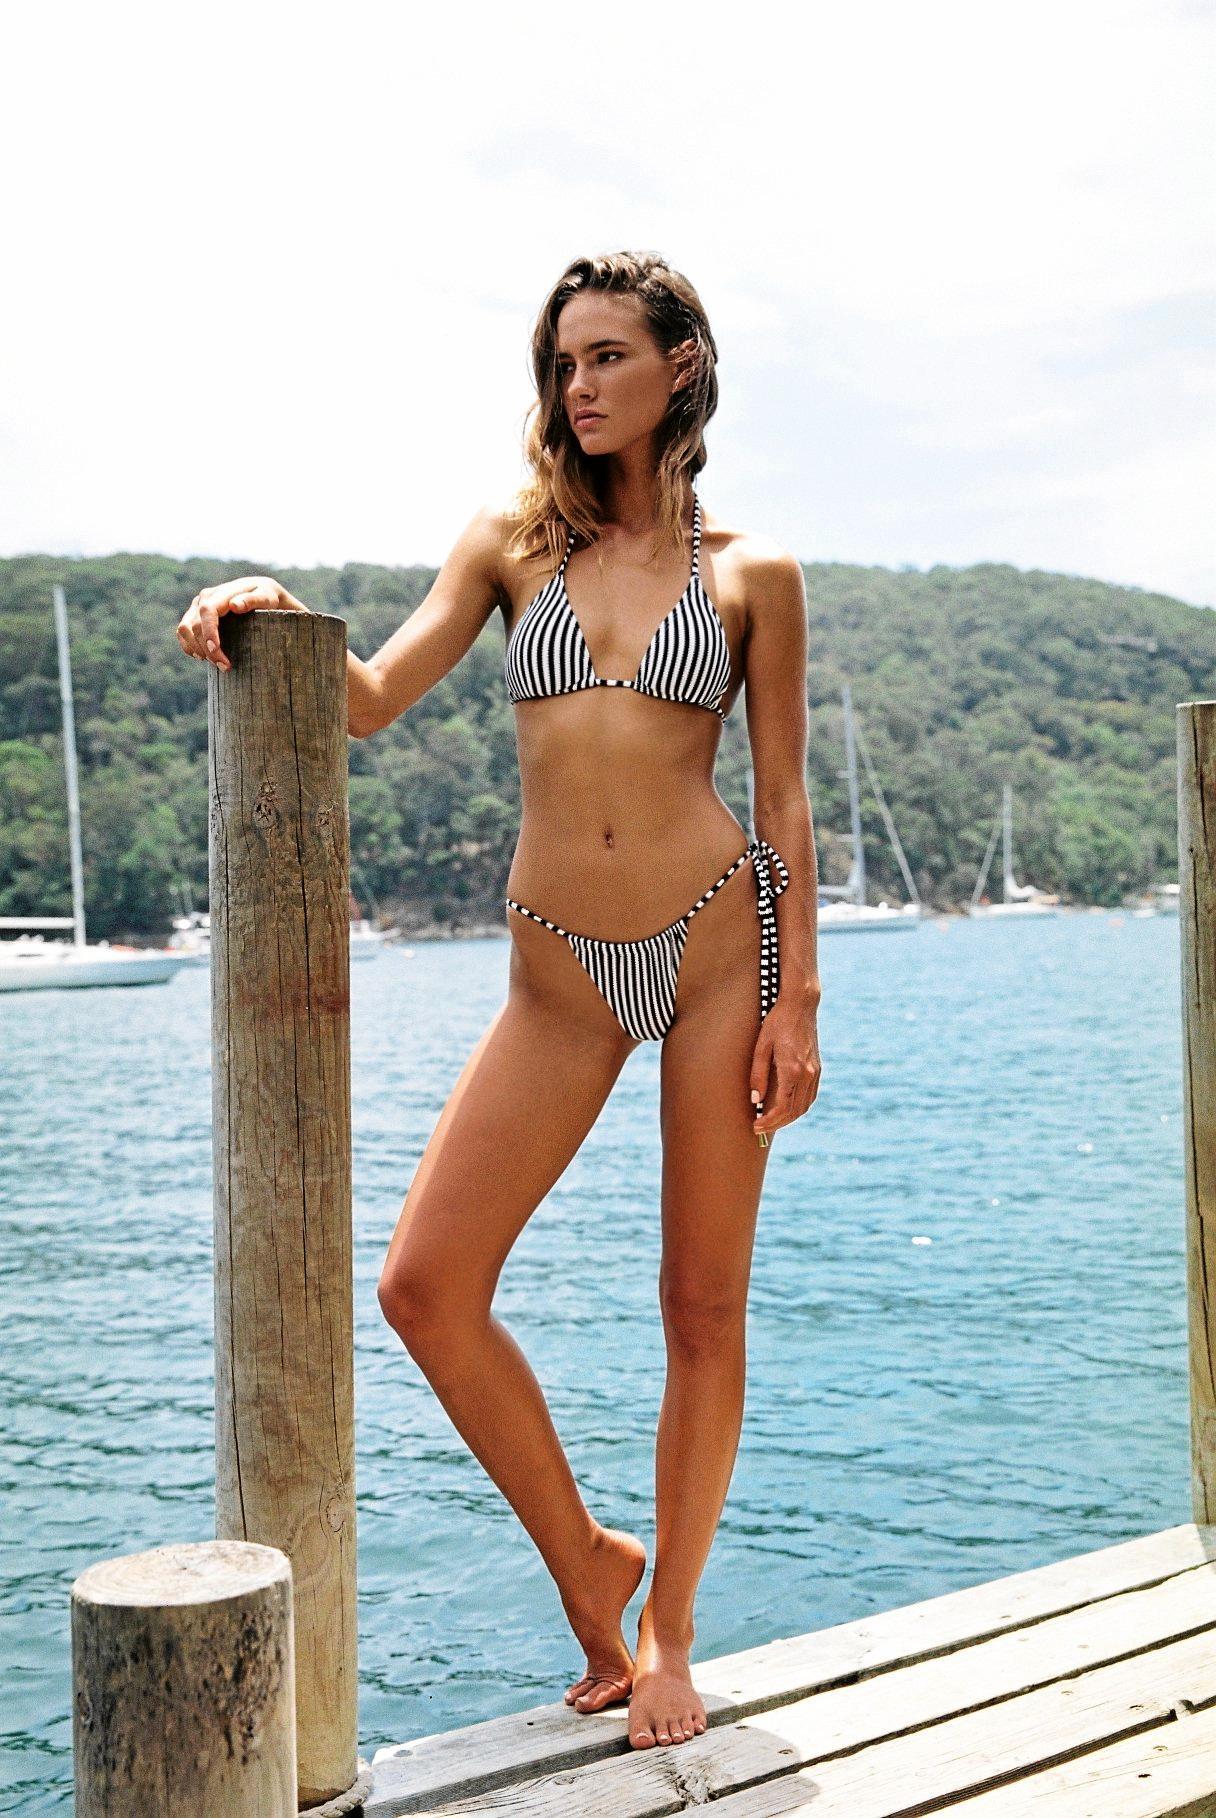 Peony Hayman string tri, $69, and Hayman Sun bottoms, $69, peonyswimwear.com